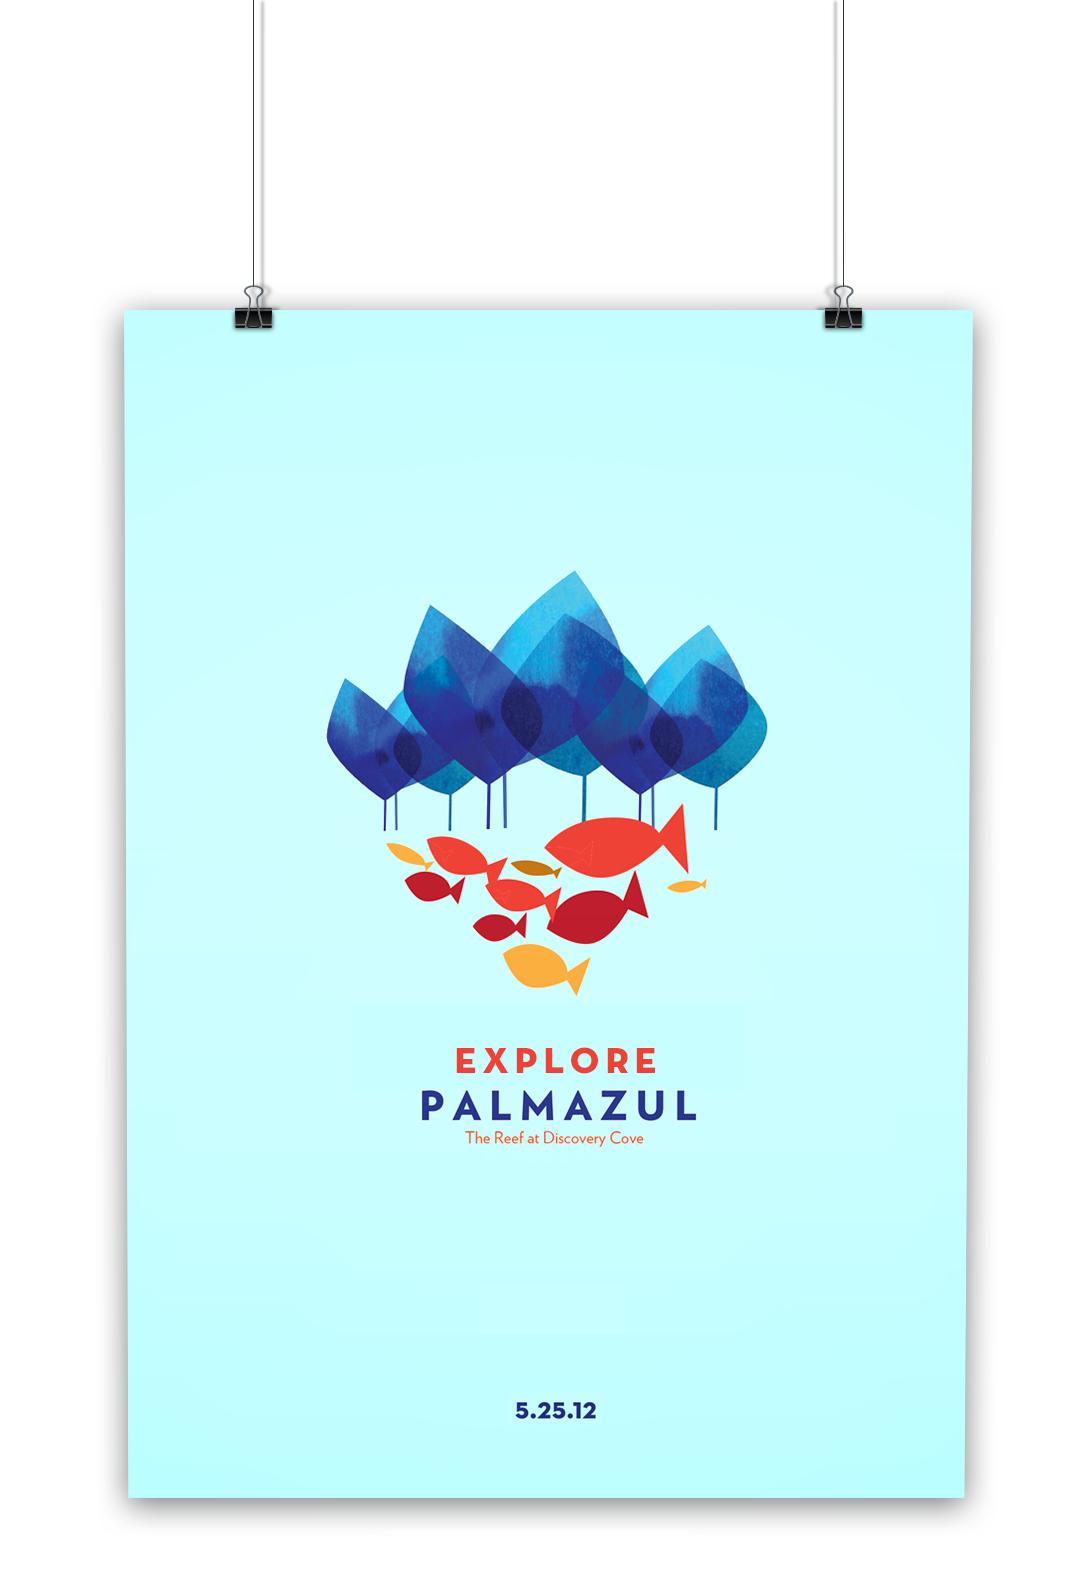 scottgericke_posters_palmazul.png